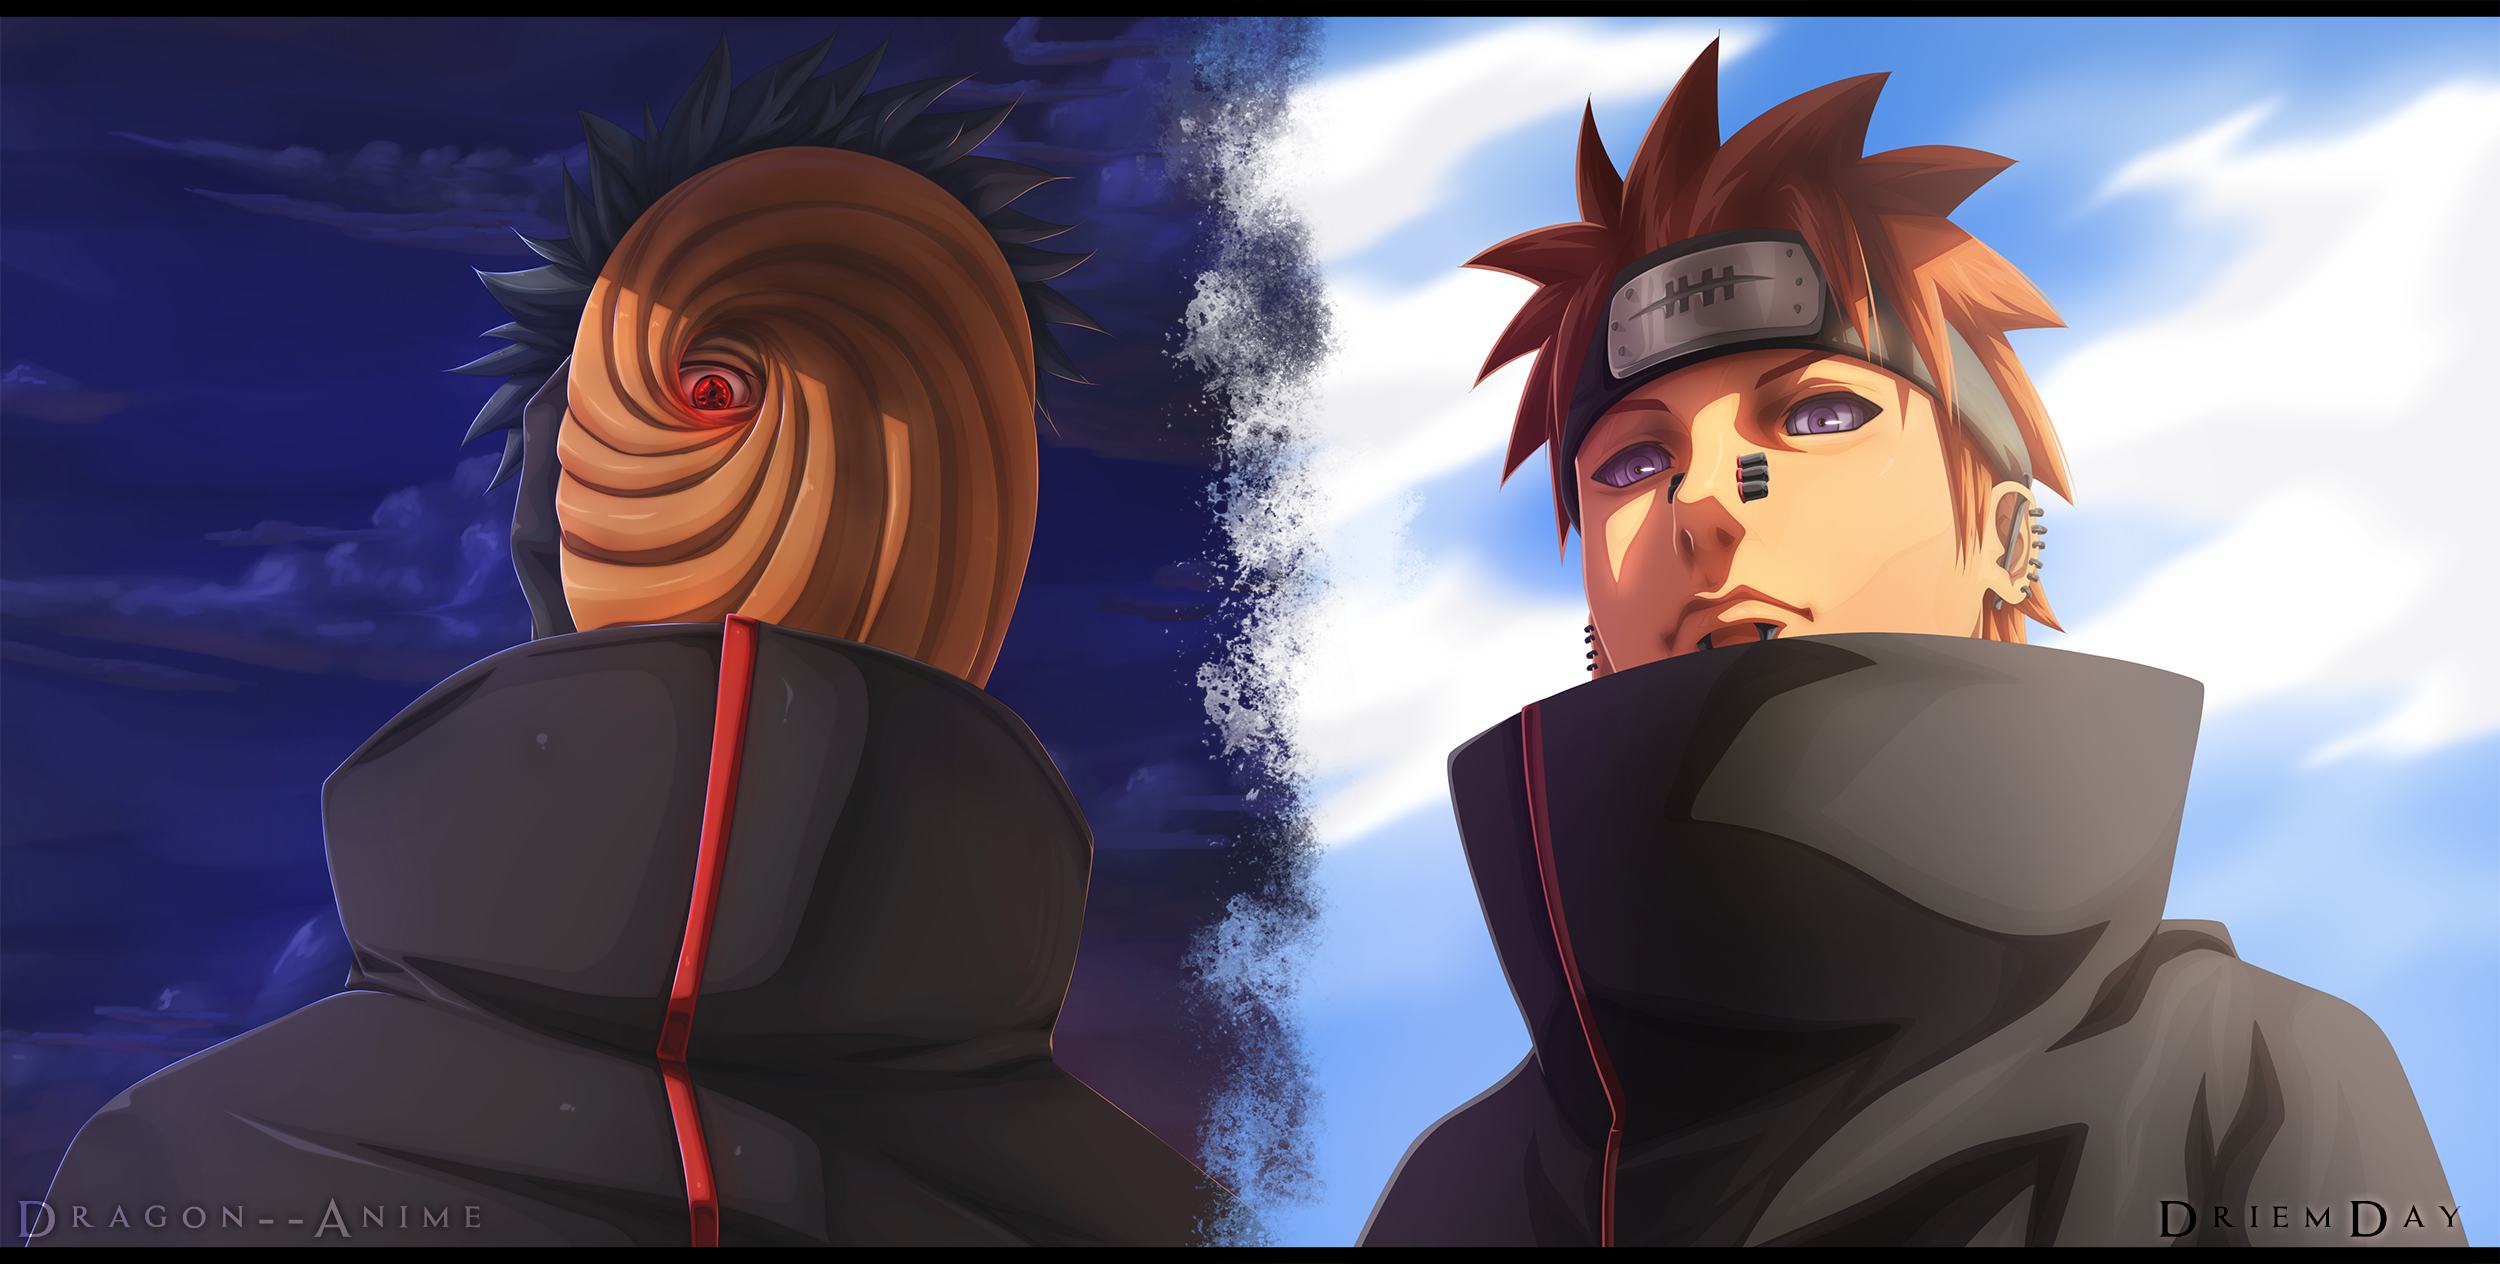 Villain Duo